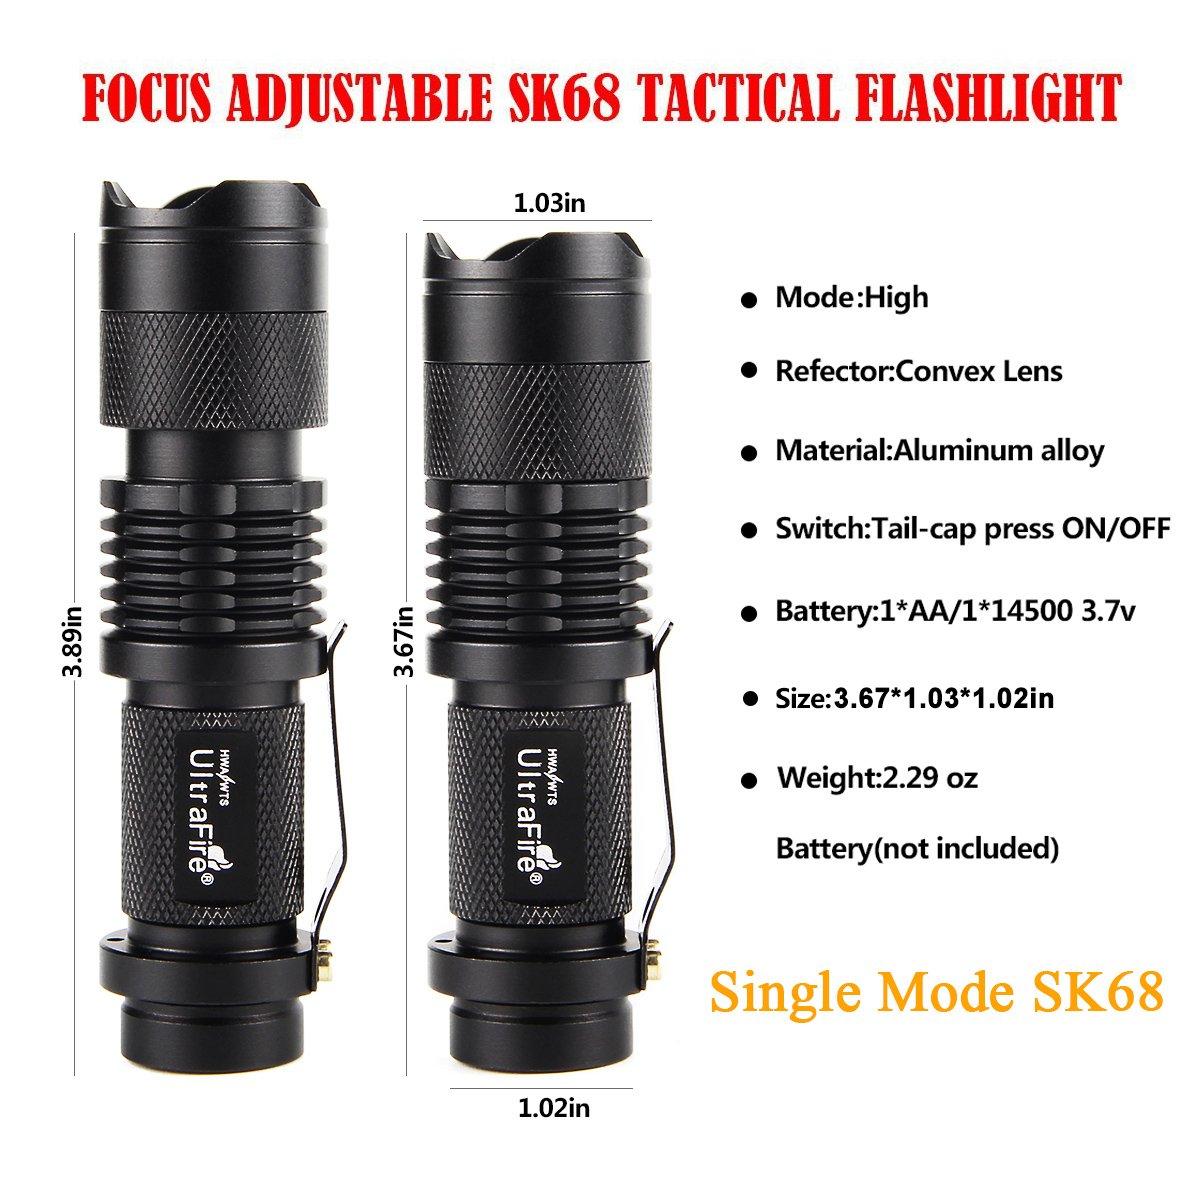 3 Pack UltraFire Mini Flashlights Focus Adjustable SK68 Single Mode Tactical LED Flashlight, Ultra Bright 300 Lumens Torch by ULTRAFIRE (Image #3)